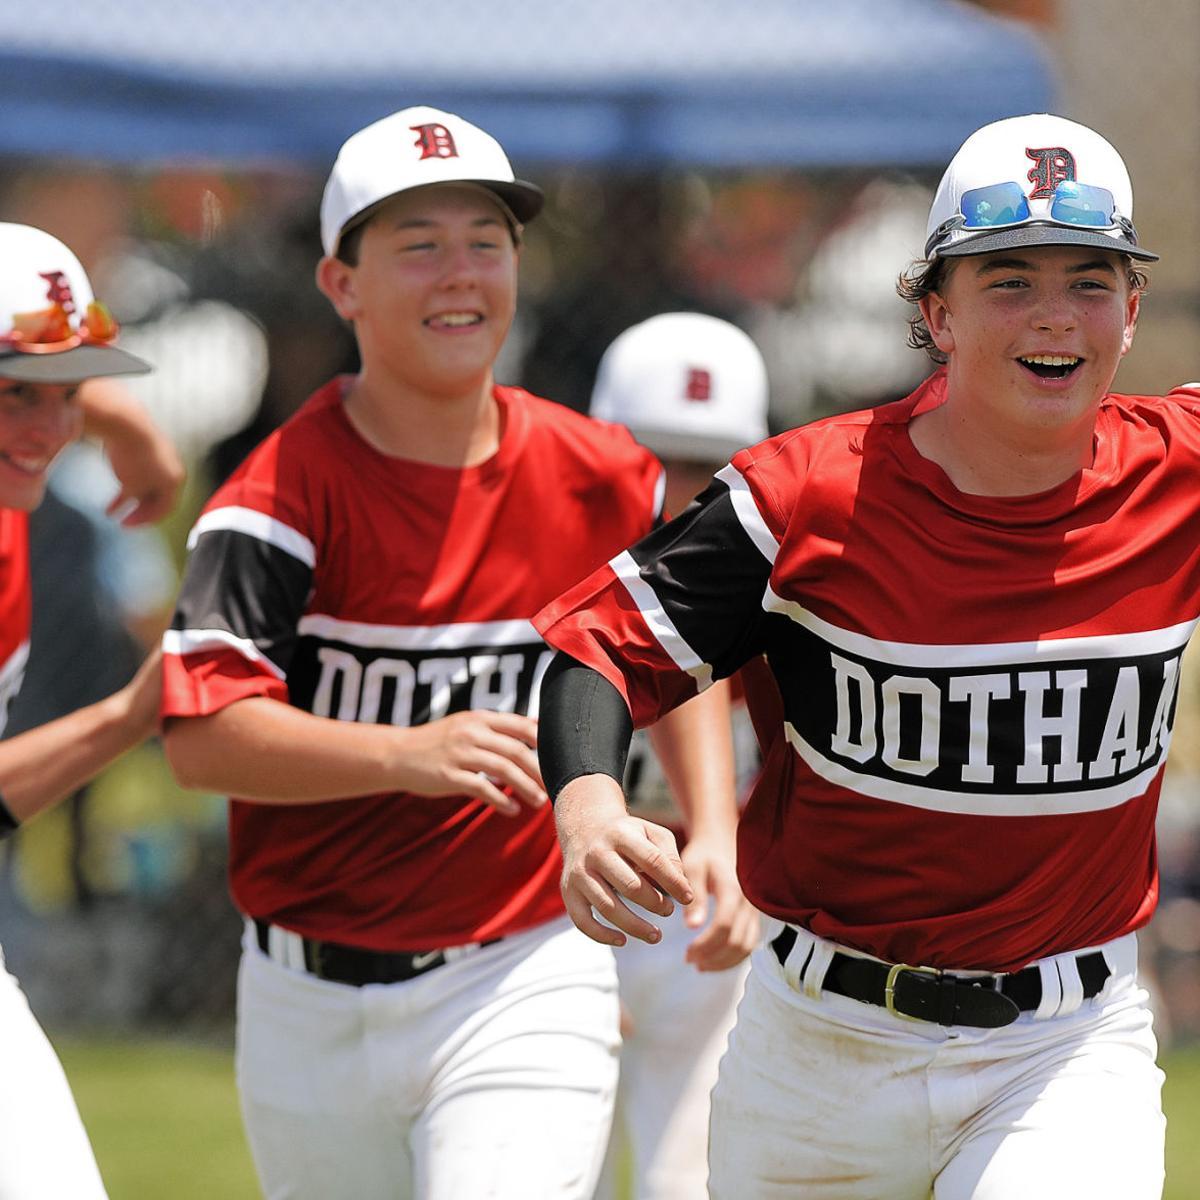 Dothan dominates Junior Dixie Boys state tourney to clinch